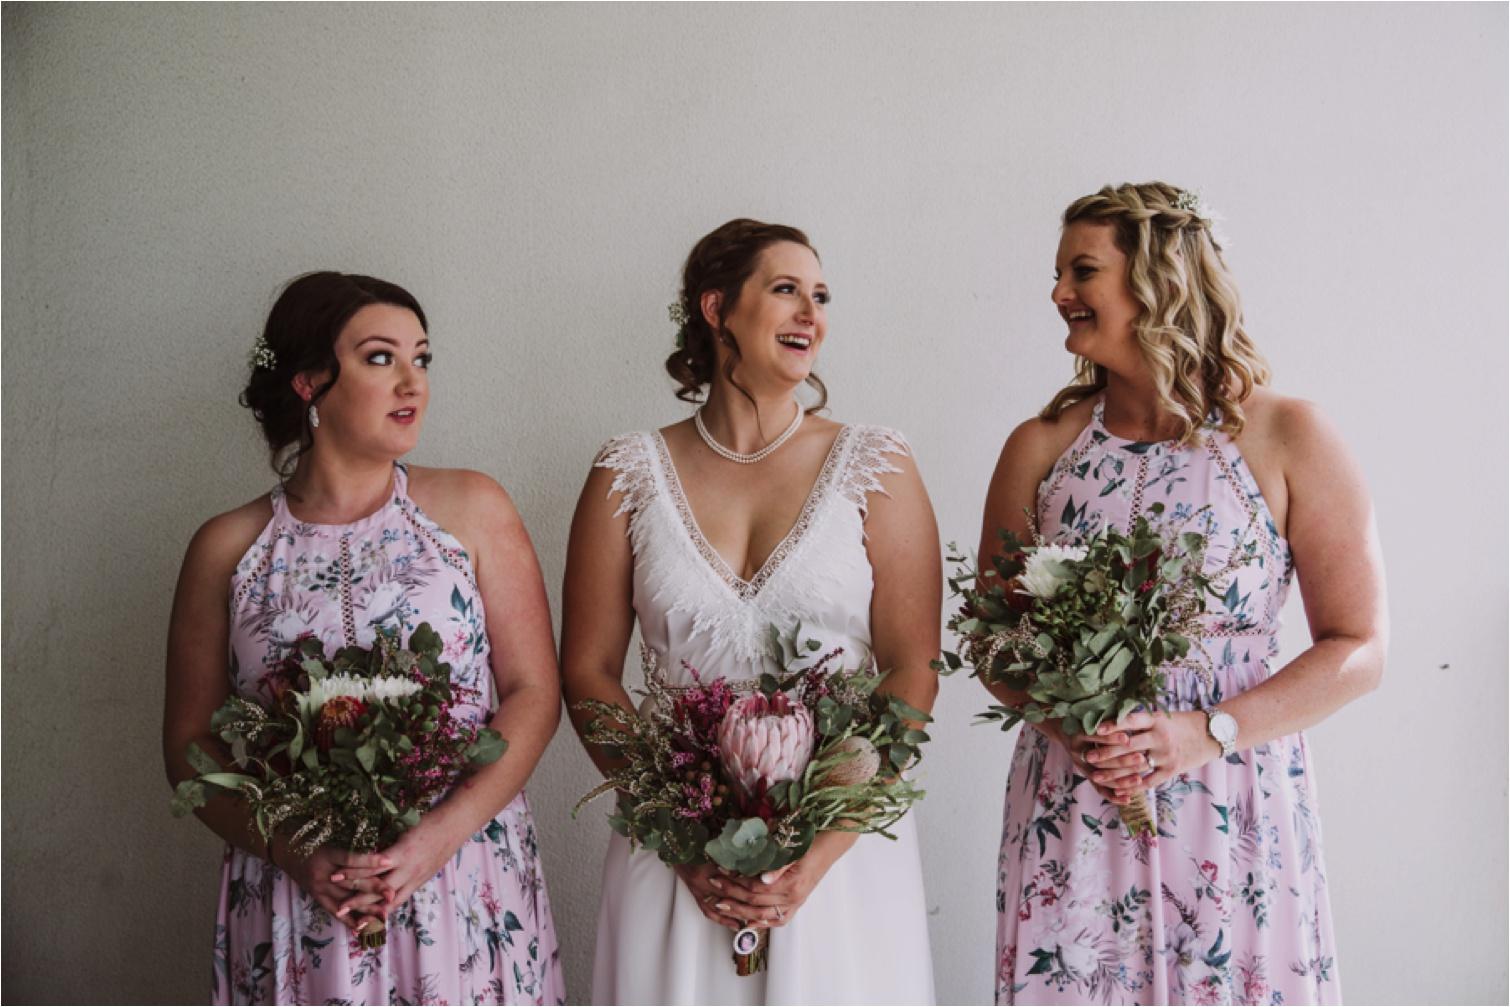 Gold Coast Wedding Photography - Riverwood Wedding_0016.jpg